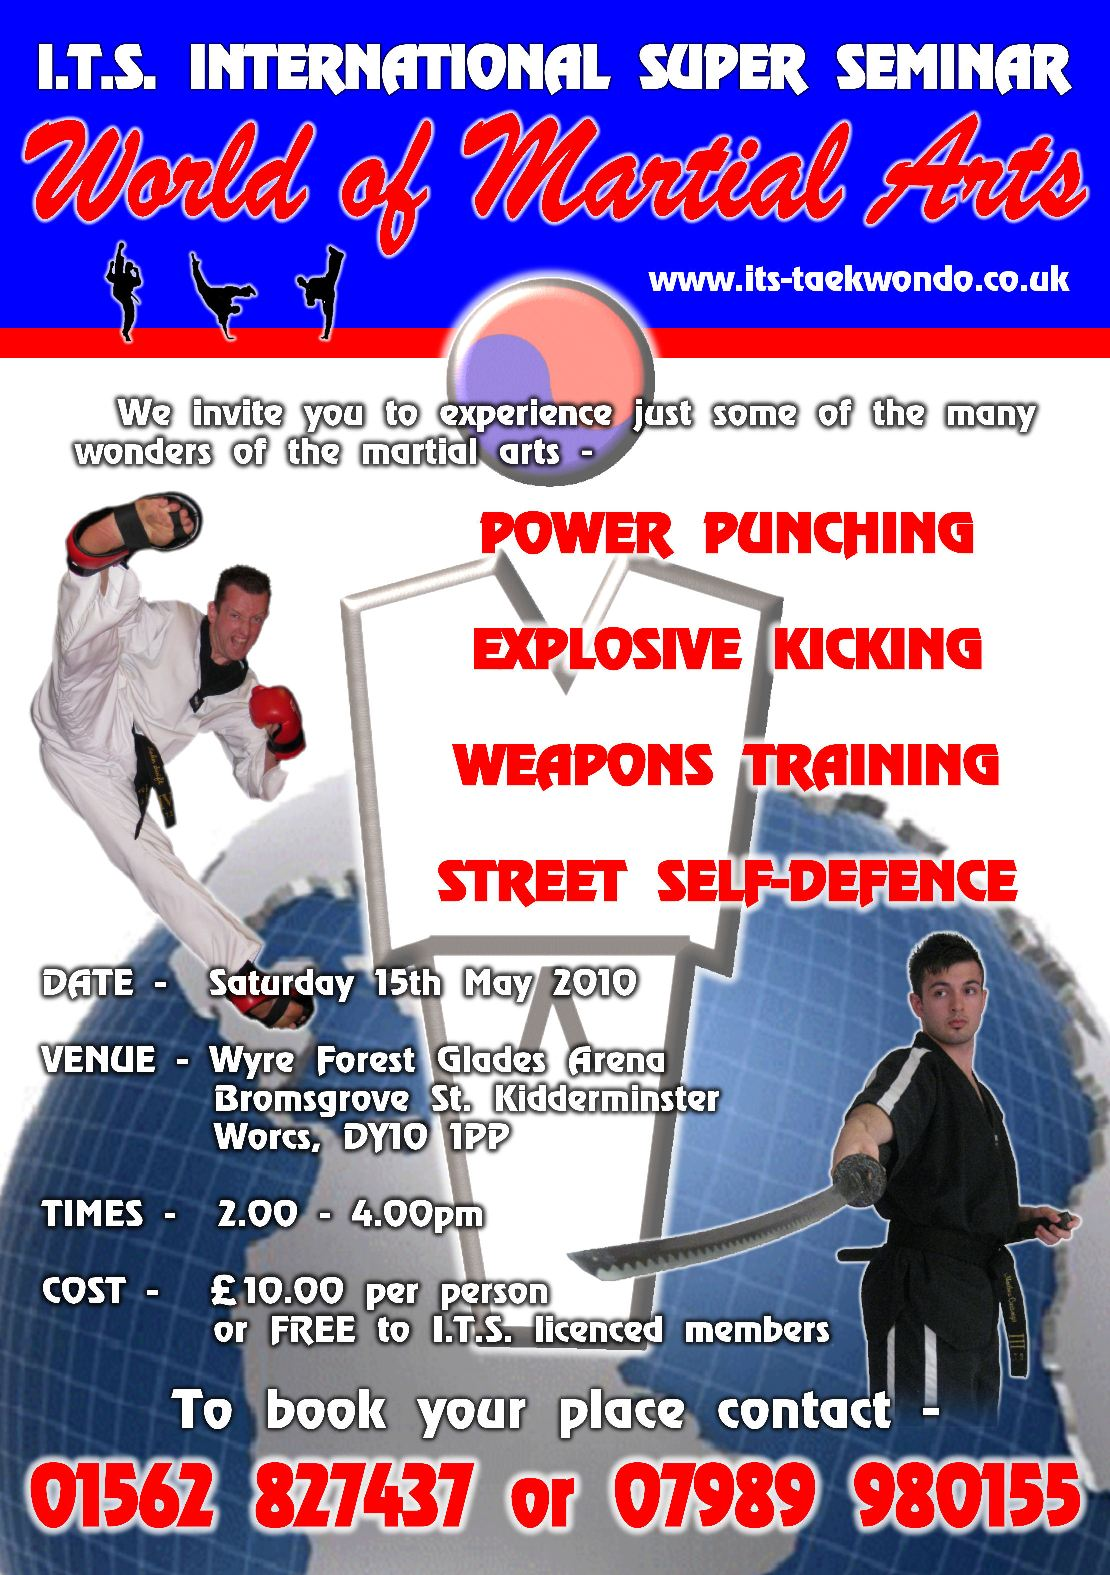 Workshops & Seminars - John Swift | Mastering the Martial Arts